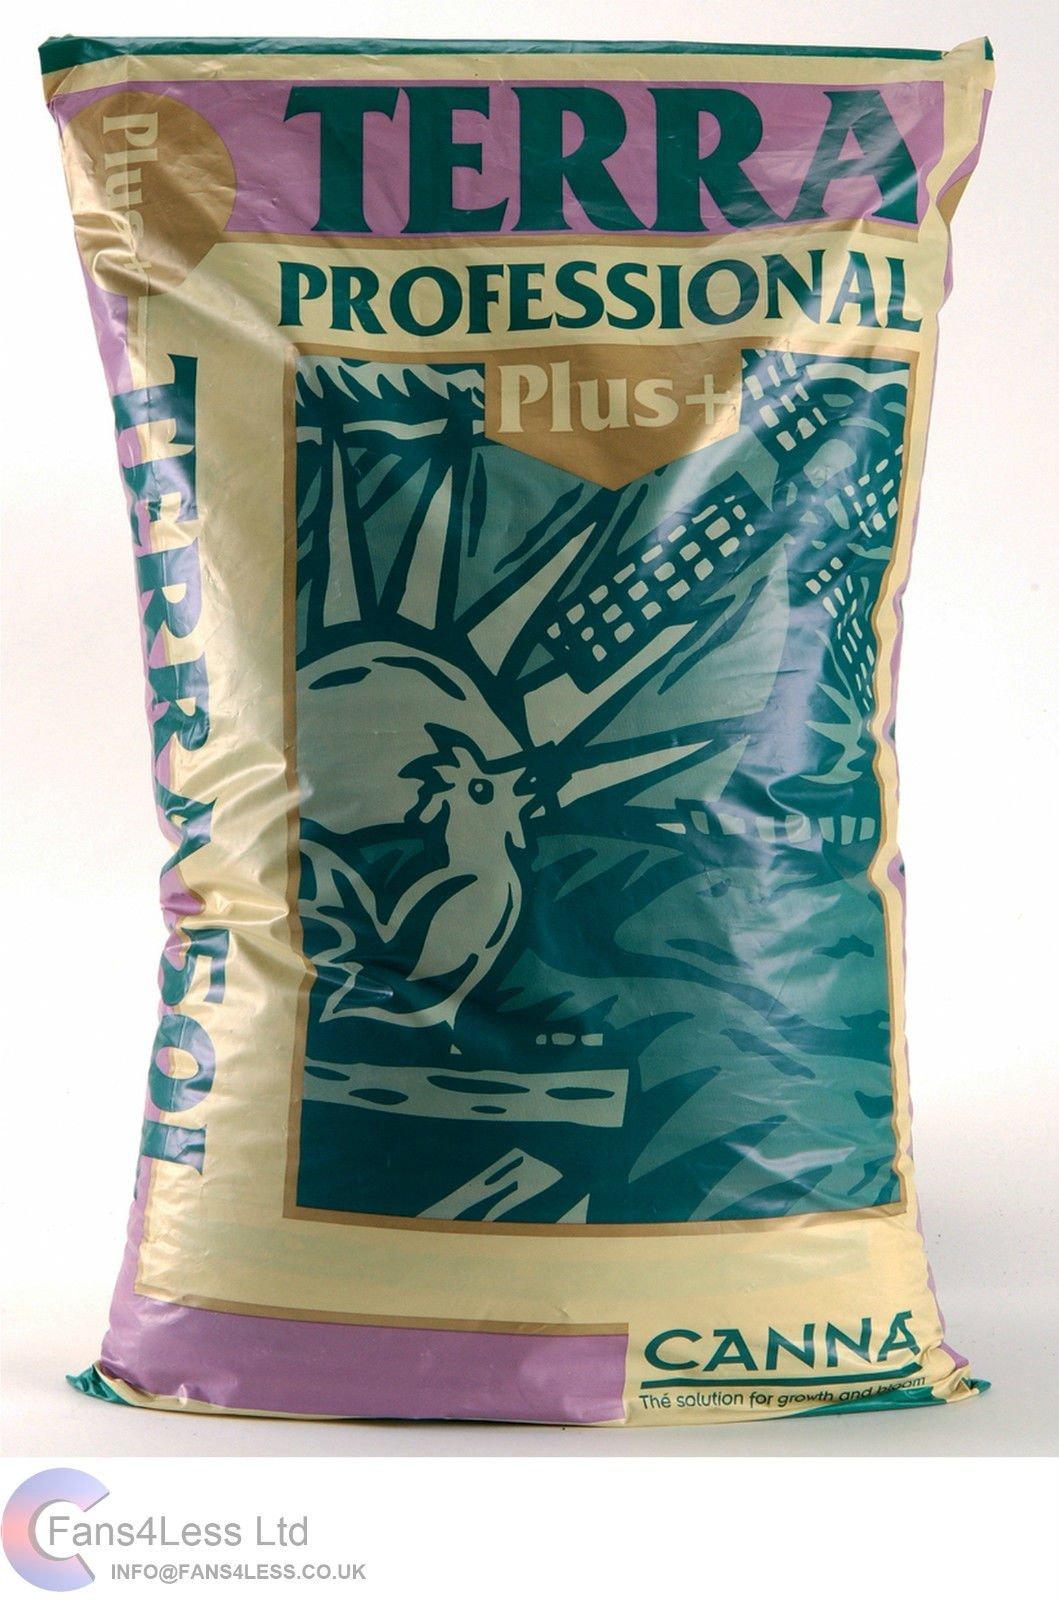 50L, 25L & 10L CANNA Terra Professional PLUS HYDROPONIC GROWING MEDIA SOIL (50 Litre) by CANNA